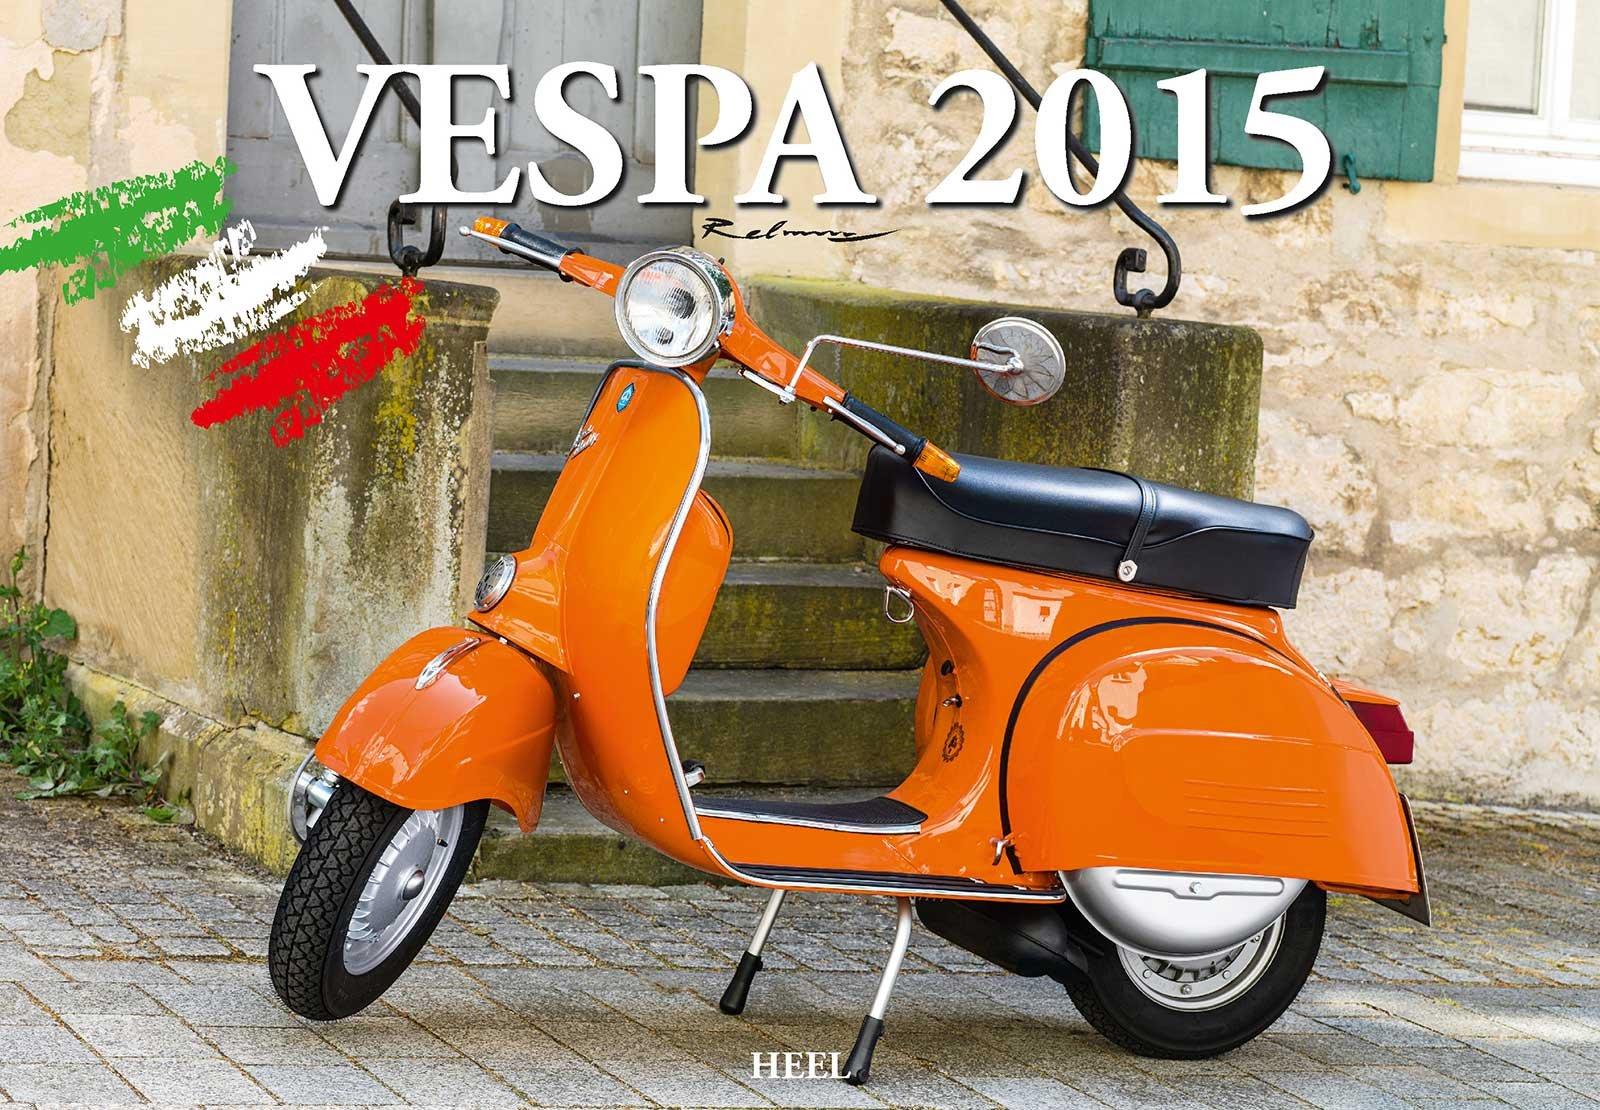 Vespa 2015